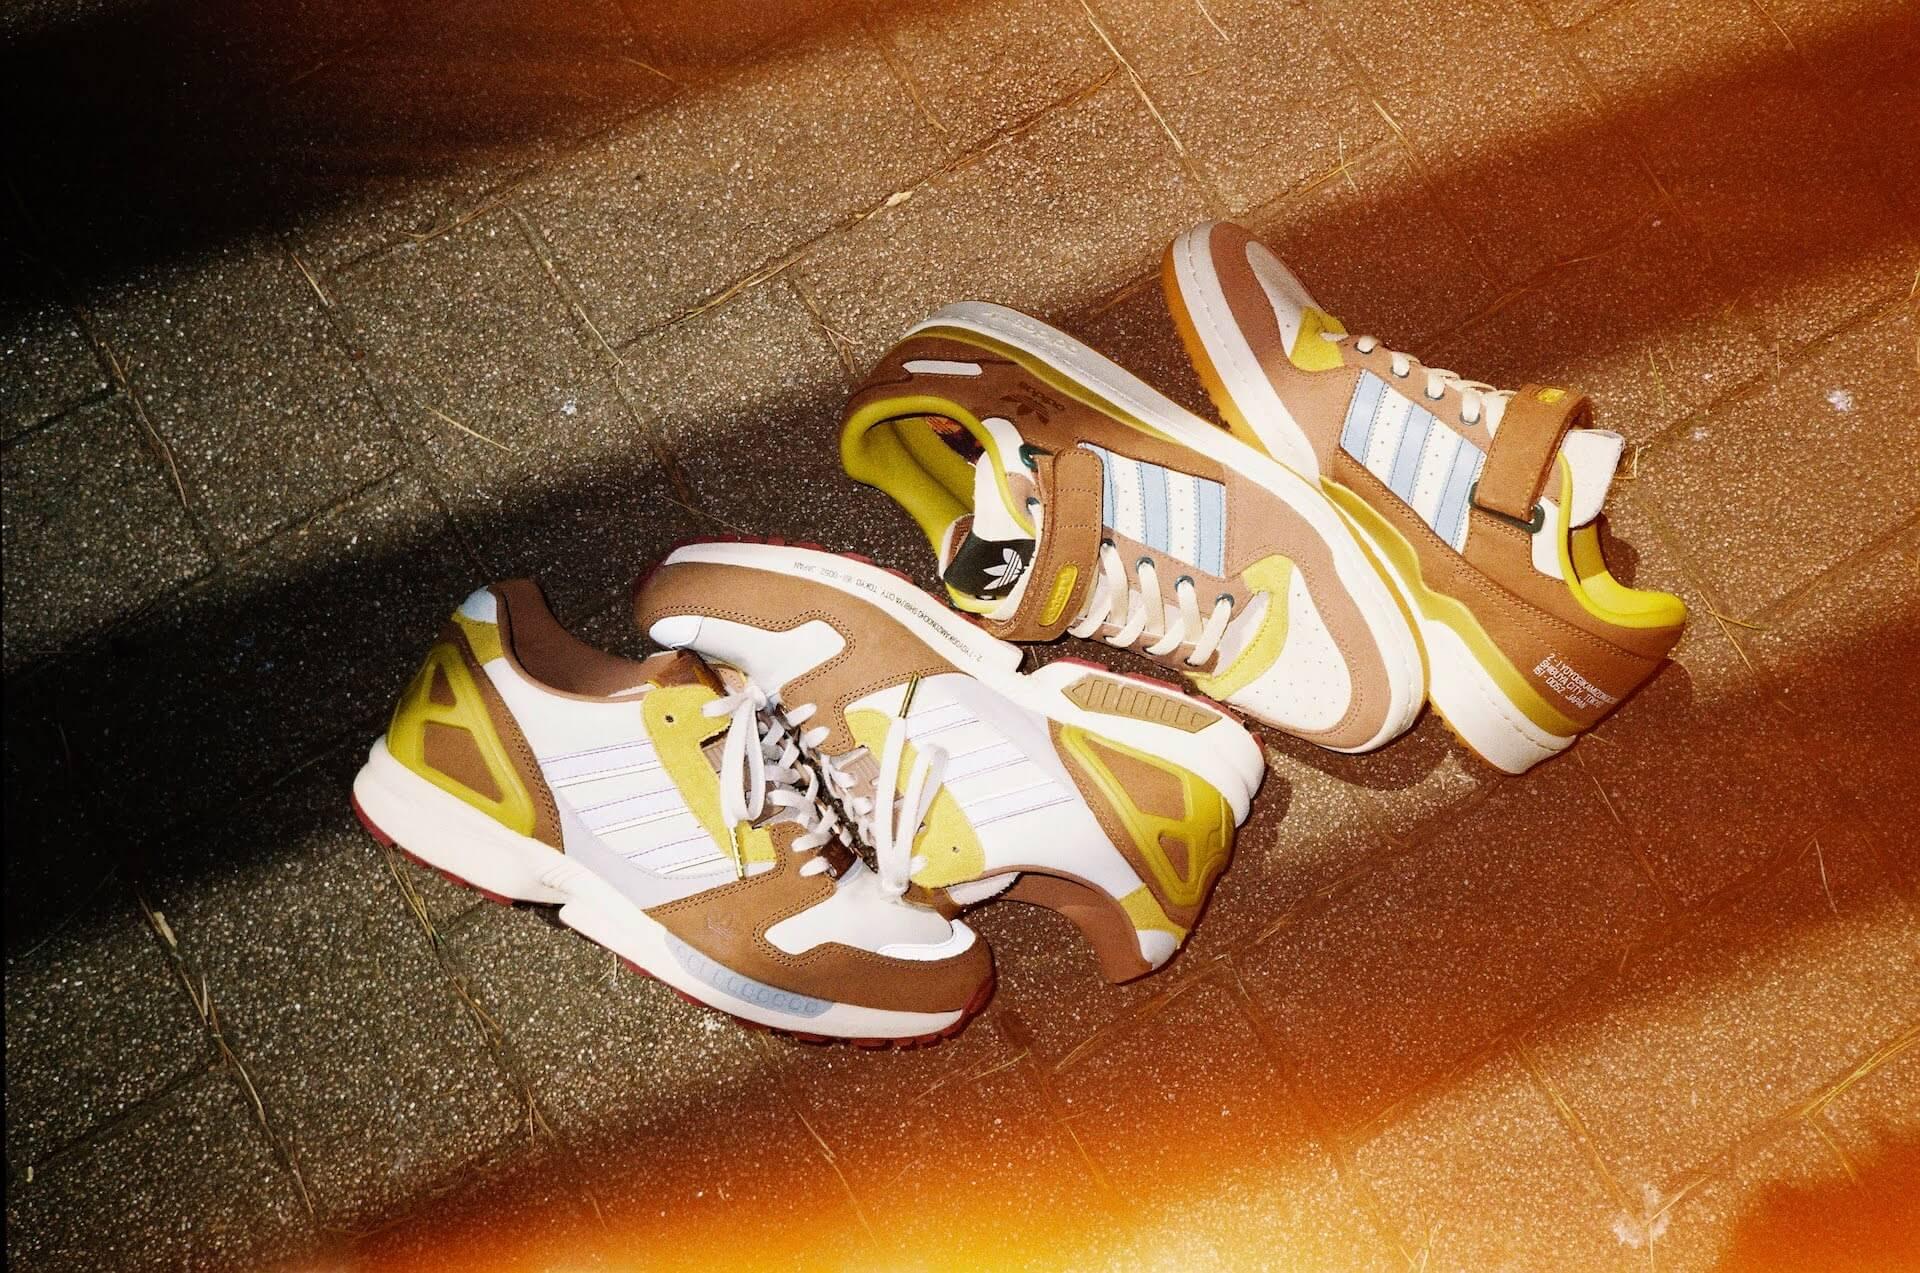 "adidas Originalsとatmosのコラボパック「""YOYOGI PARK"" PACK」が登場!代々木公園をモチーフにしたZX 8000、FORUMの2足が発売 life210802_adidasoriginals_yoyogipark_9"